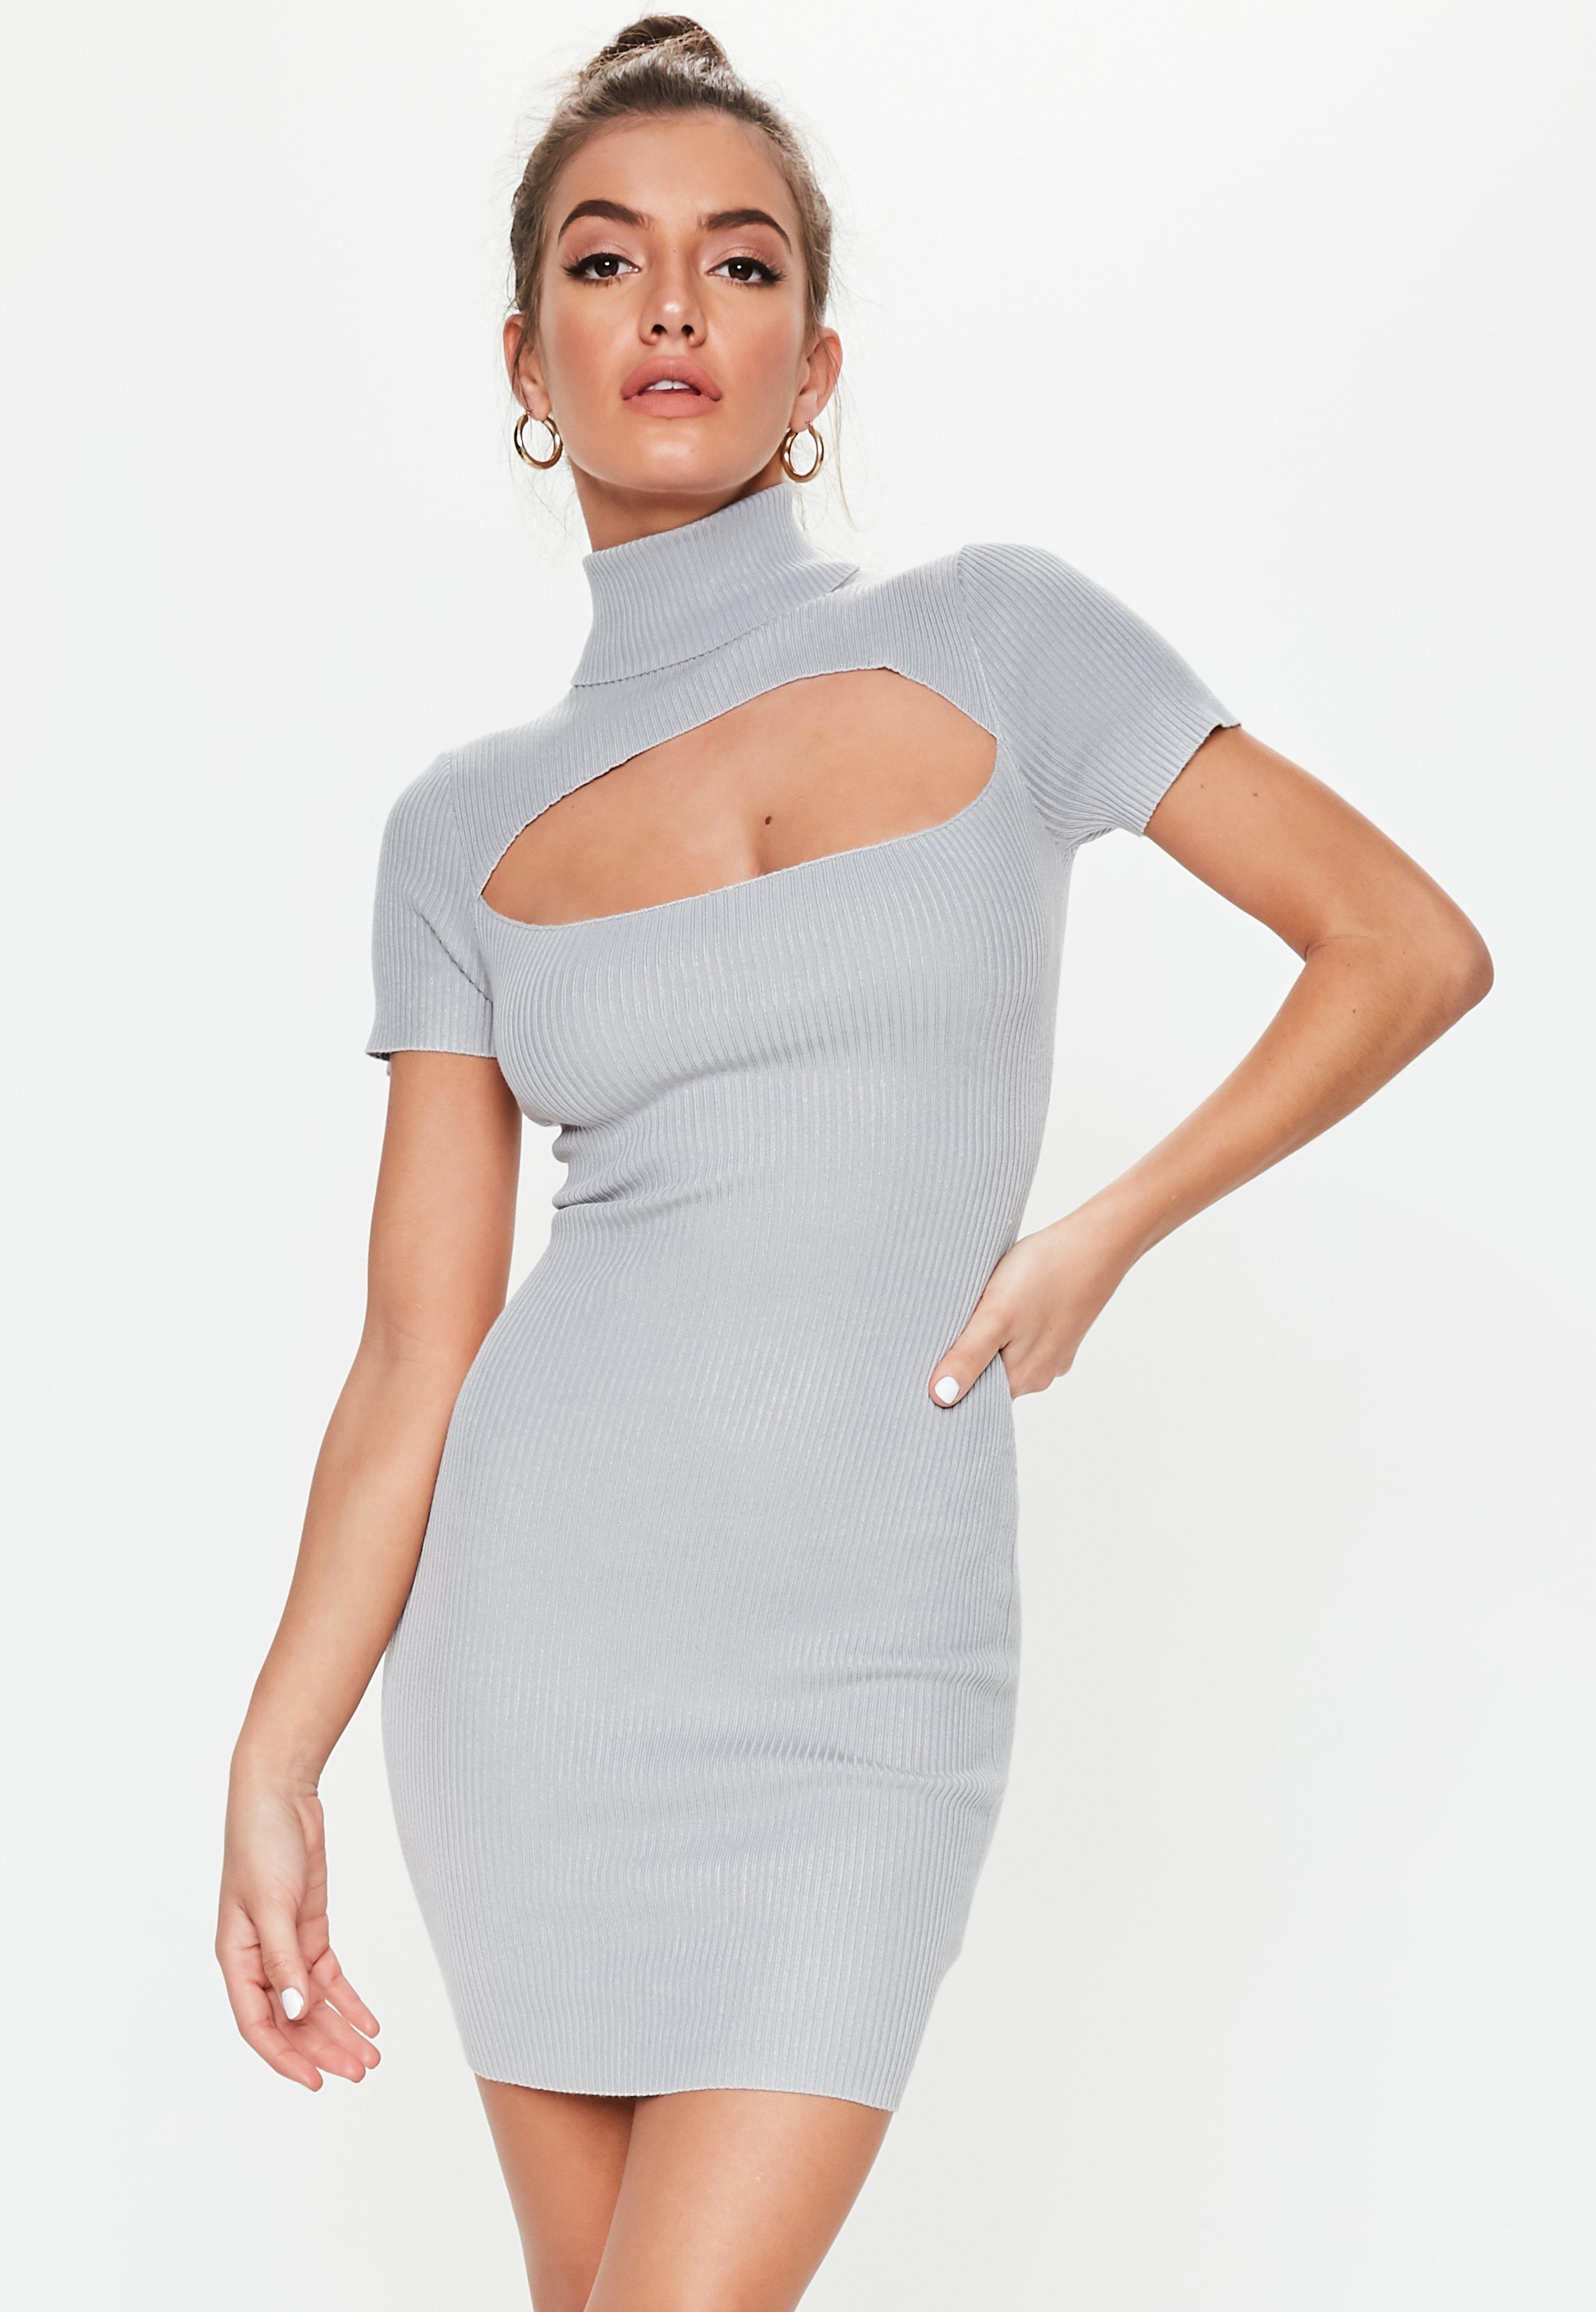 6fba8e0f8742 Jumper Dresses | Shop Knitted Dresses - Missguided